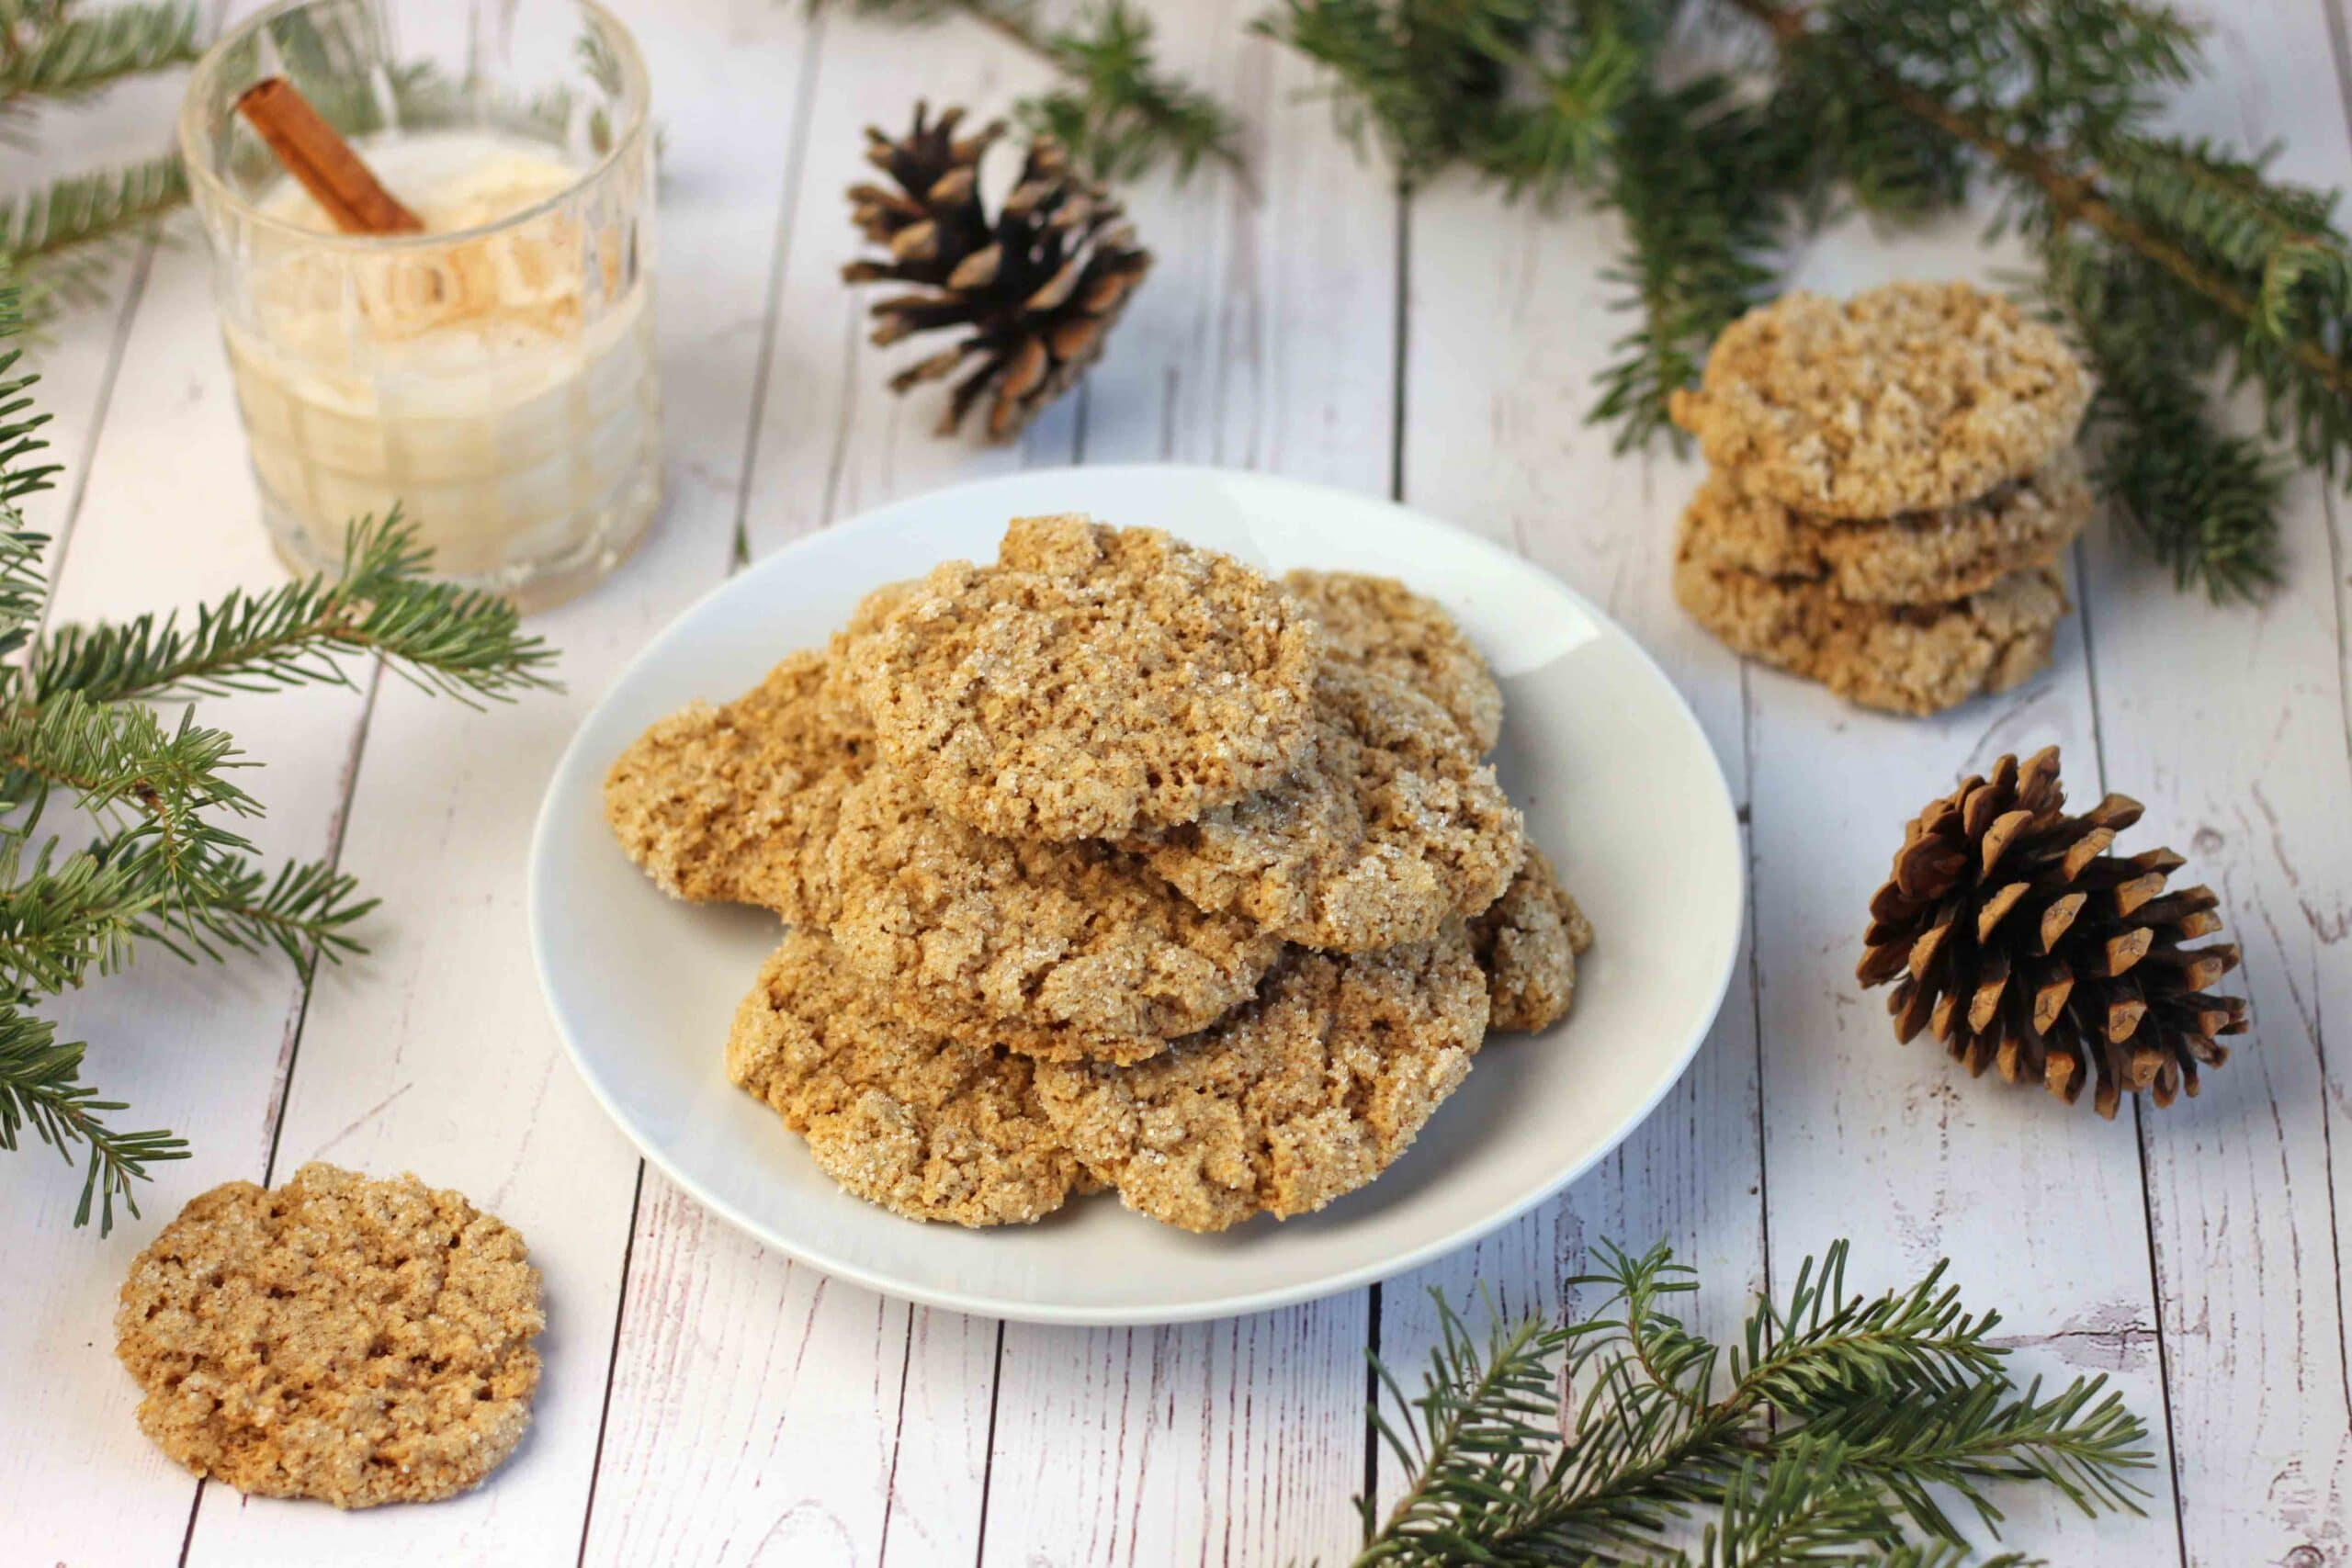 Oatmeal Eggnog Cookies by Jesse Lane Wellness